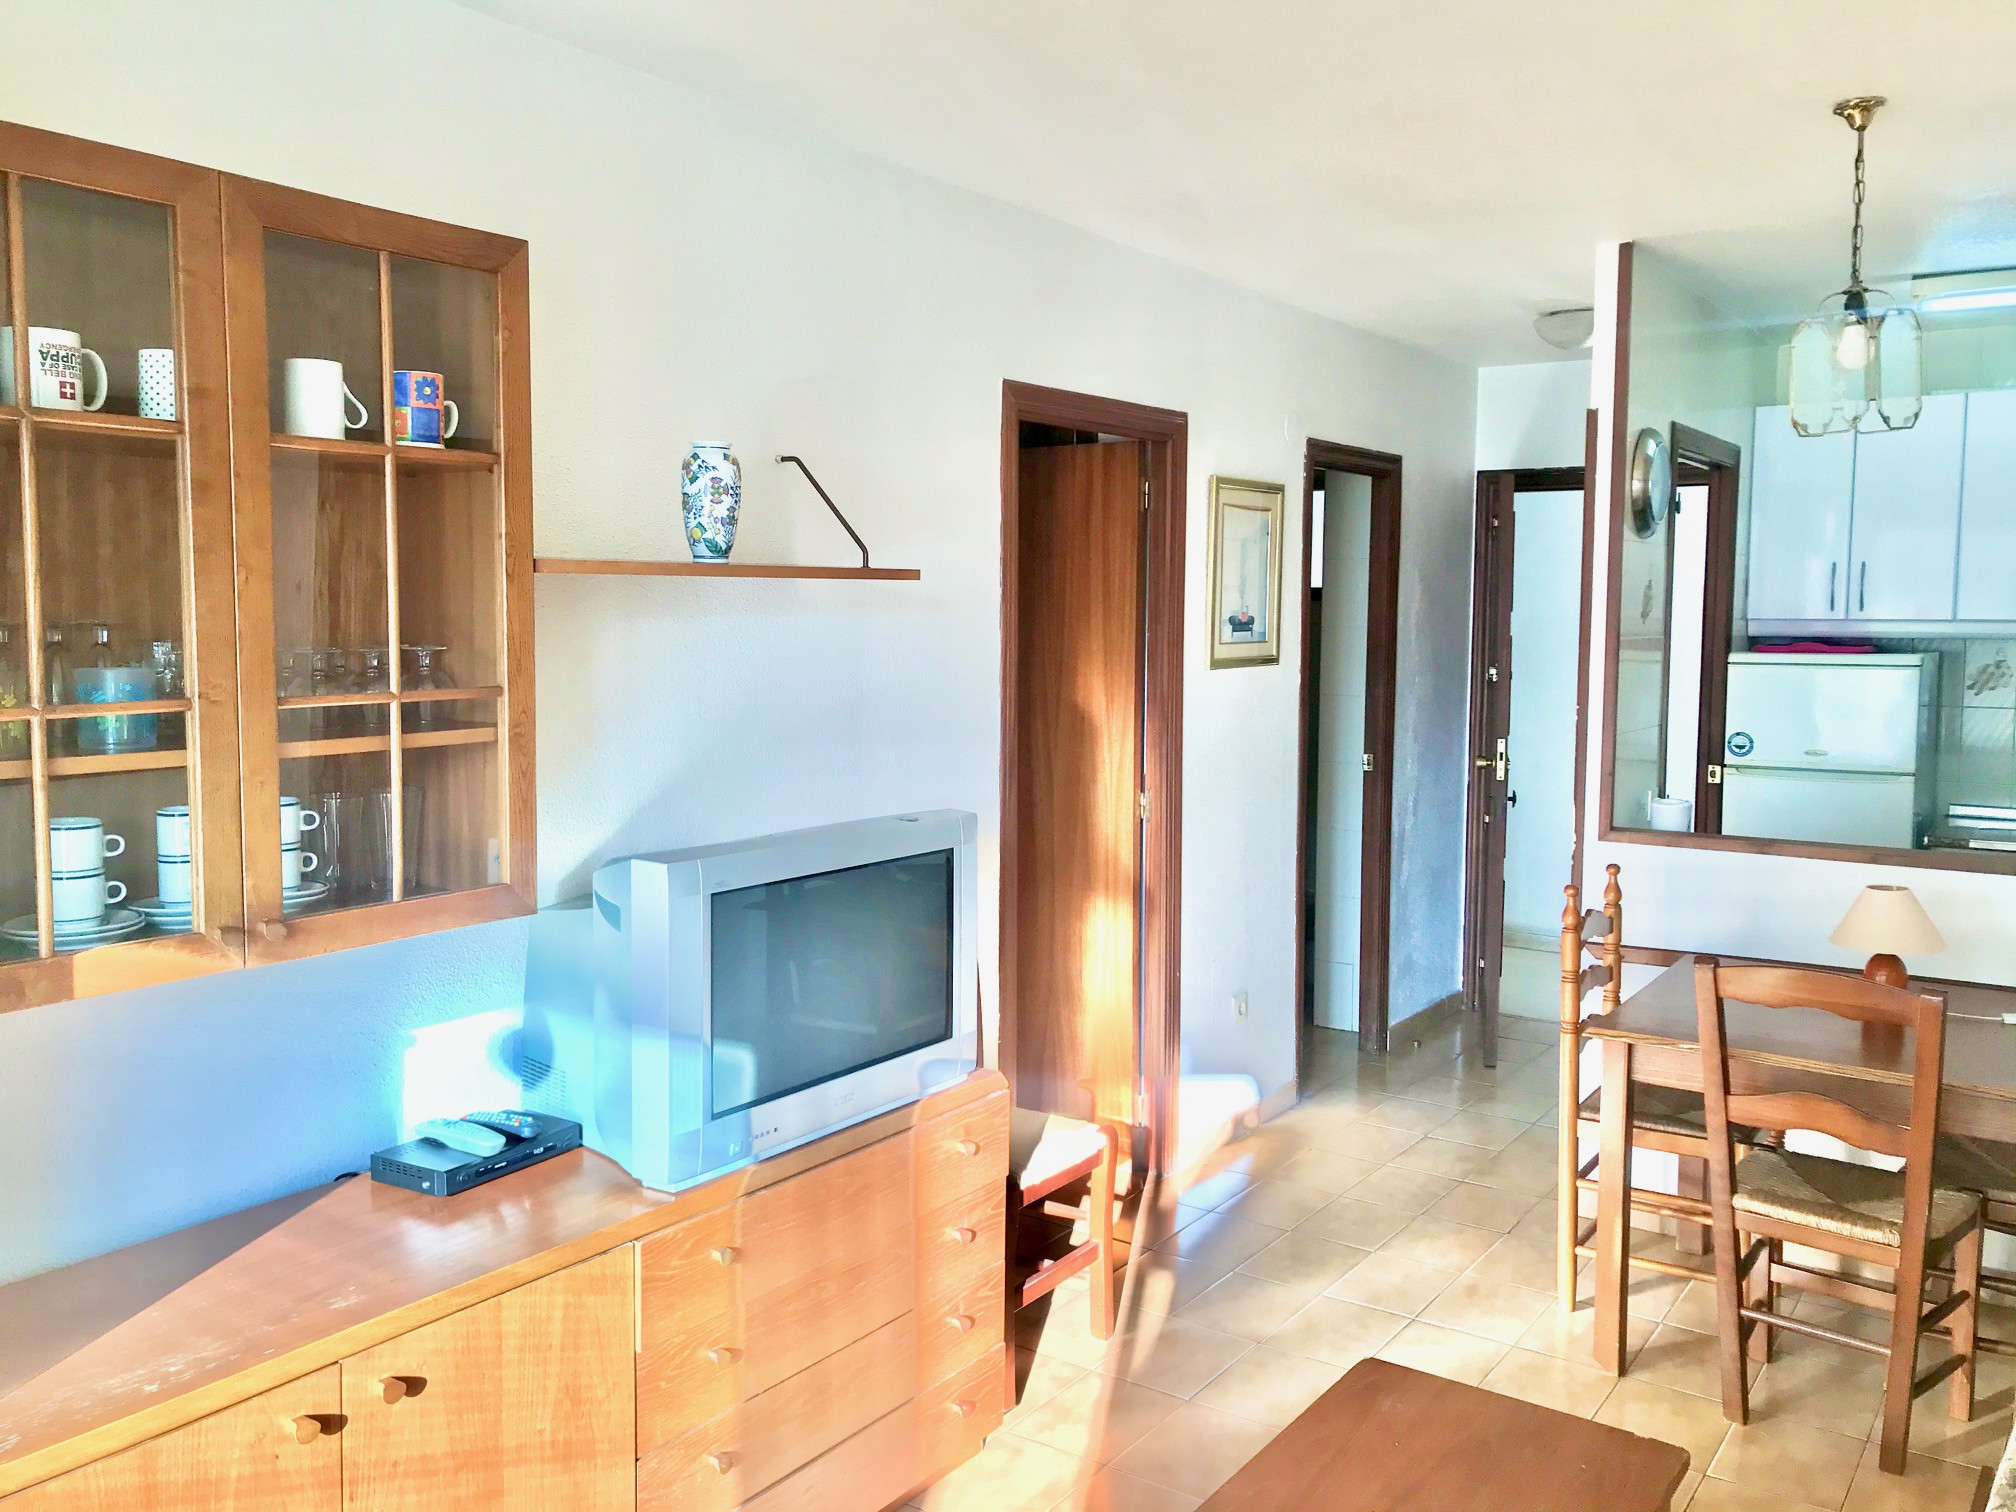 APARTMENT IN LEVANTE BEACH BENIDORM R522 - Apartments in ...